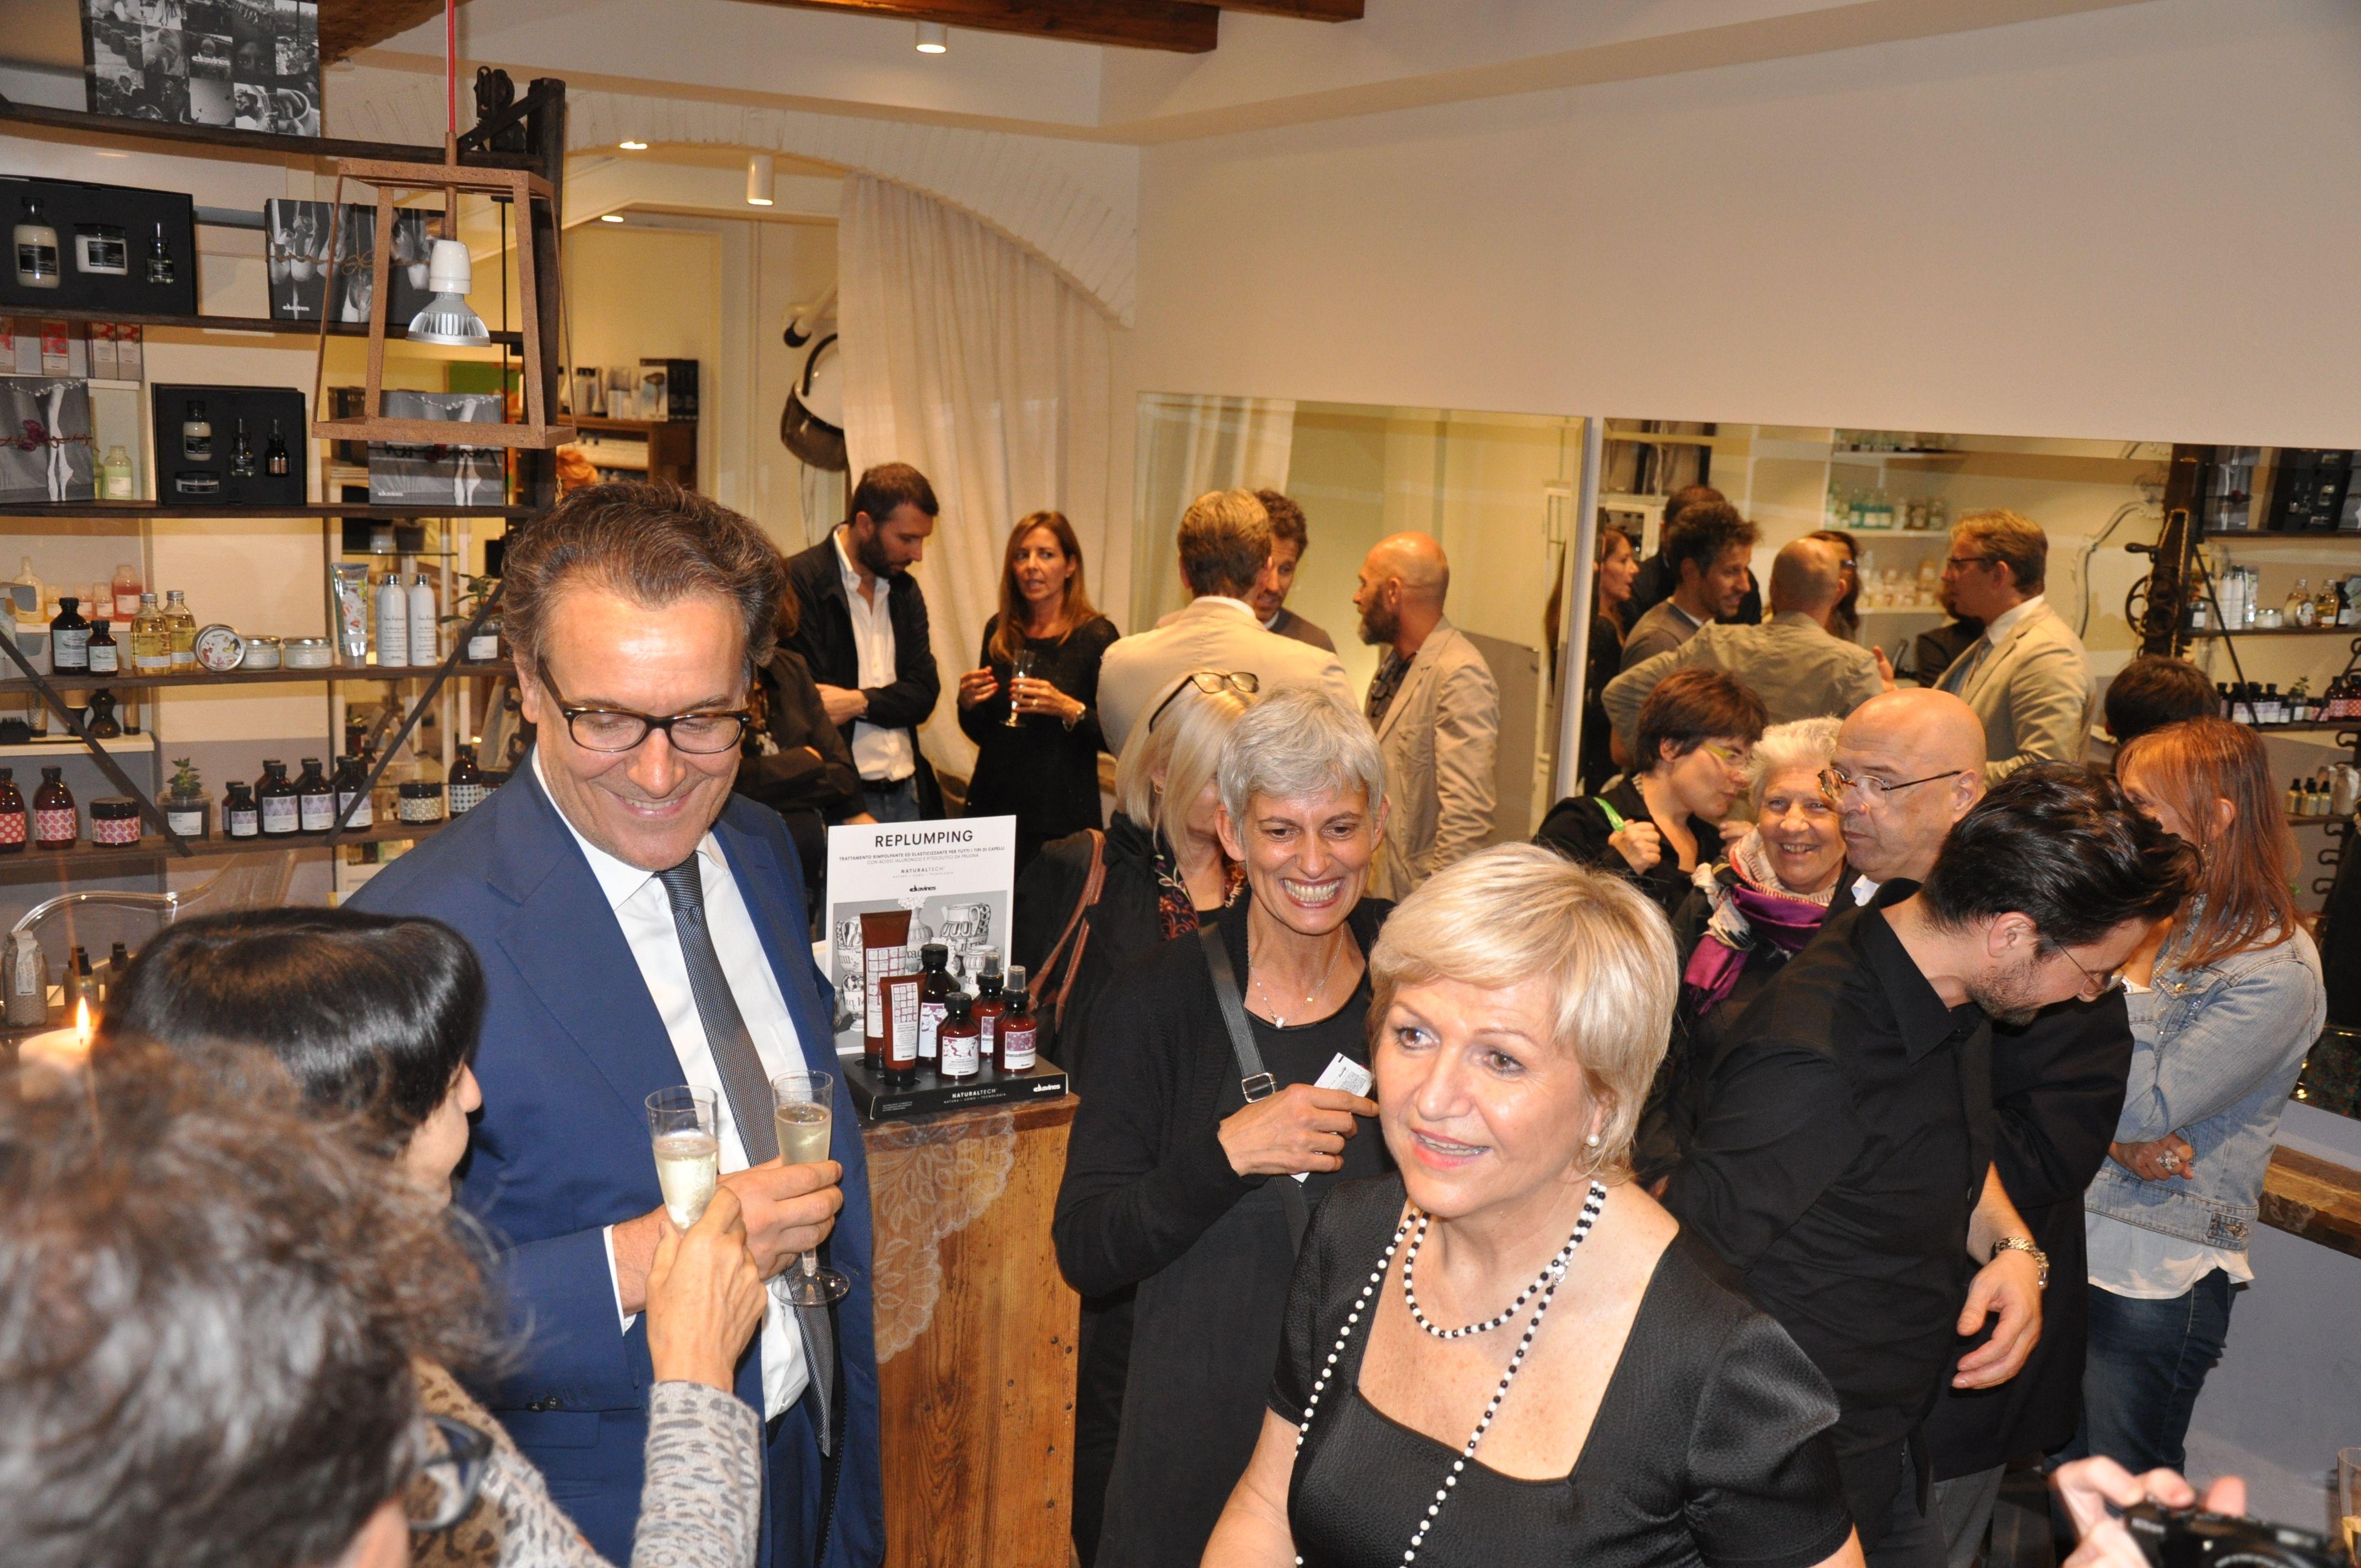 Inside Chiara Hair Studio Verona Aperitivo a lume di candela